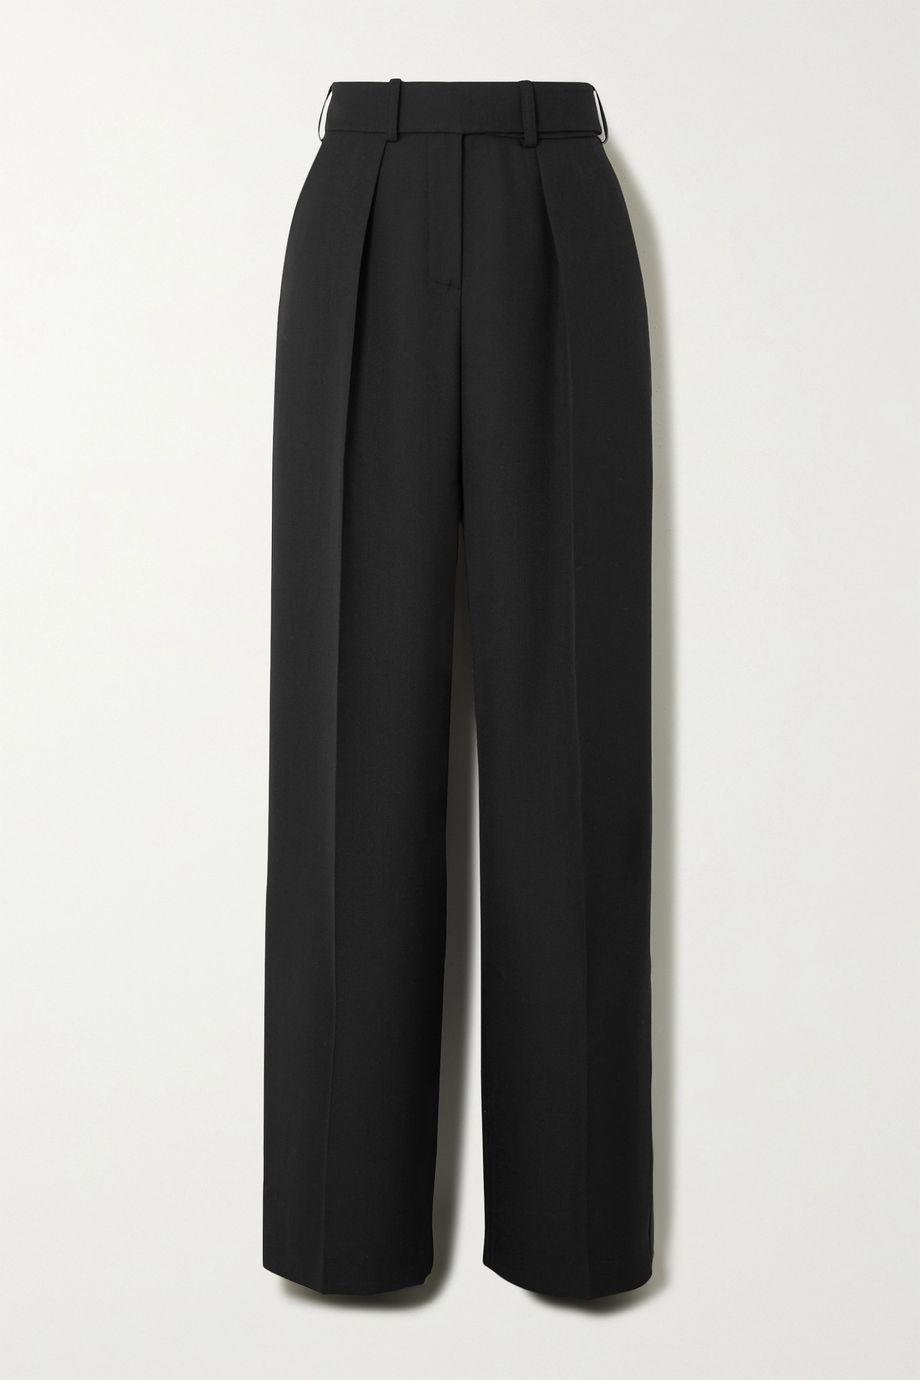 Alexandre Vauthier Wool-gabardine wide-leg pants